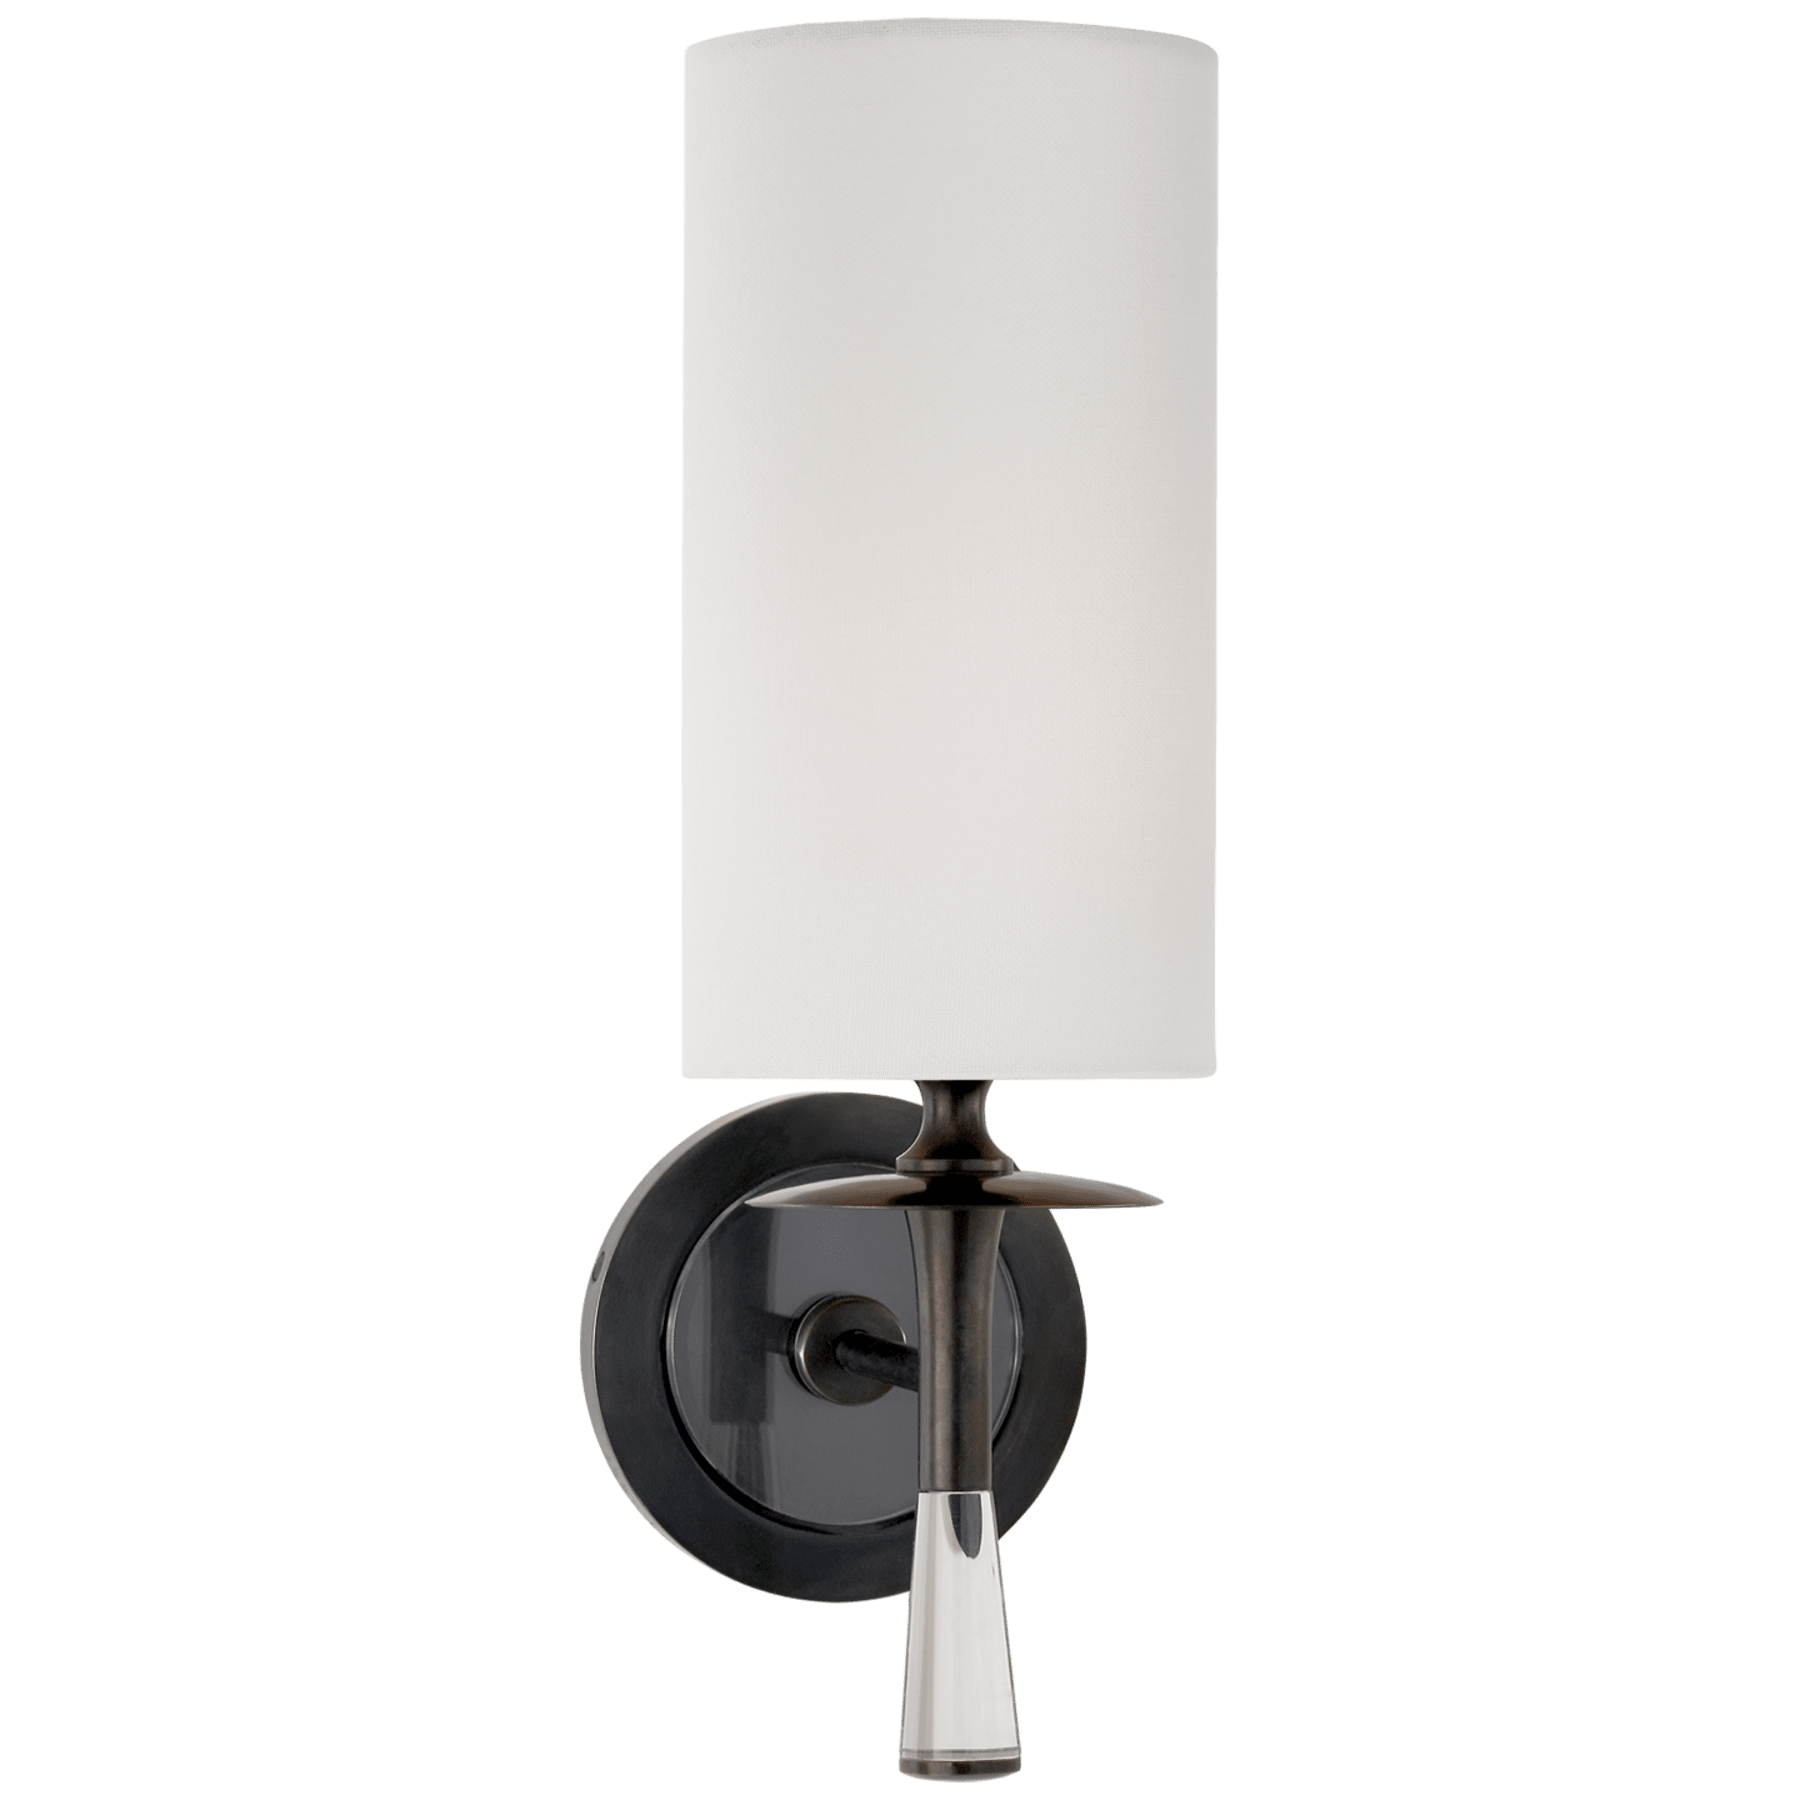 Drunmore Single Sconce Design Aerin Circa Lighting